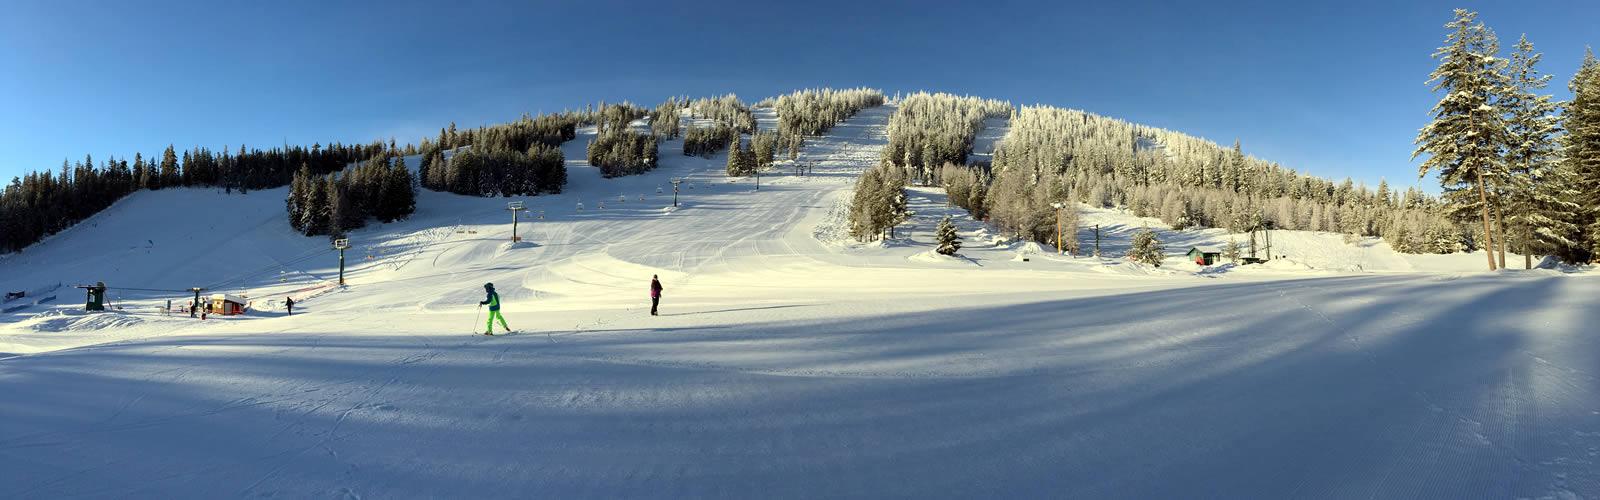 Loup Loup Ski Bowl View from the Base